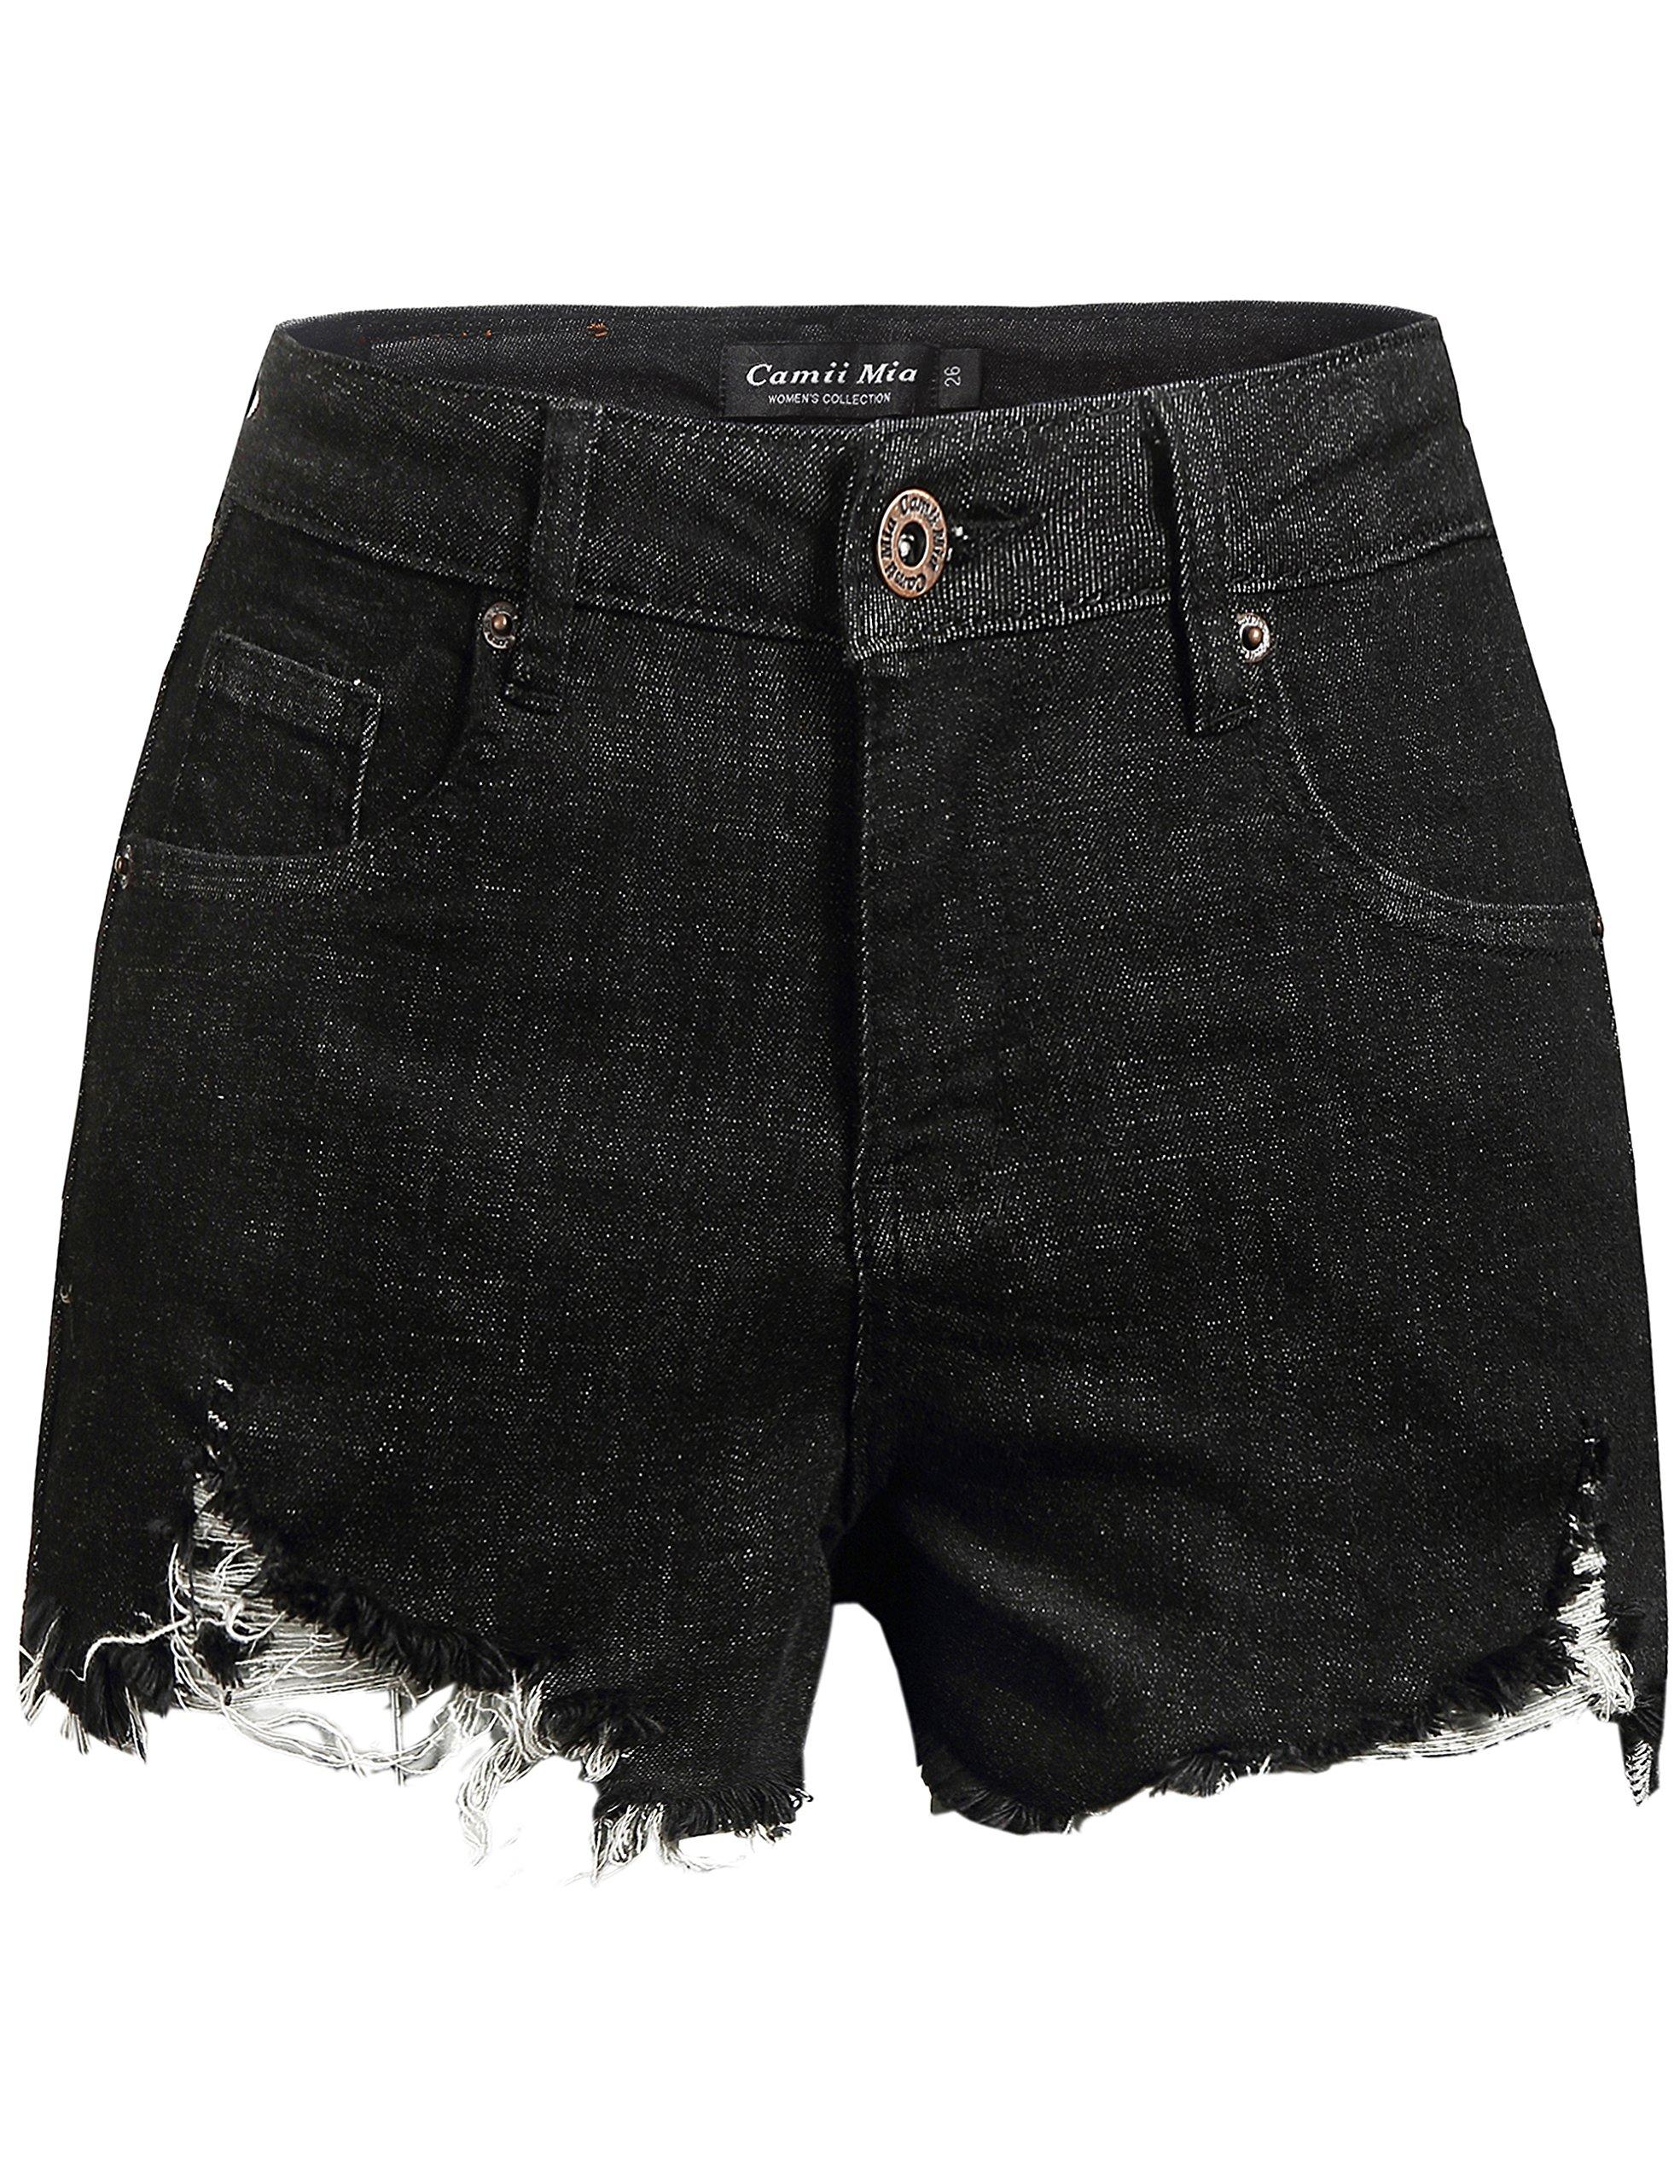 Camii Mia Women's Distressed Cutoff Mid Rise Stretch Slim Denim Shorts (30, Black)